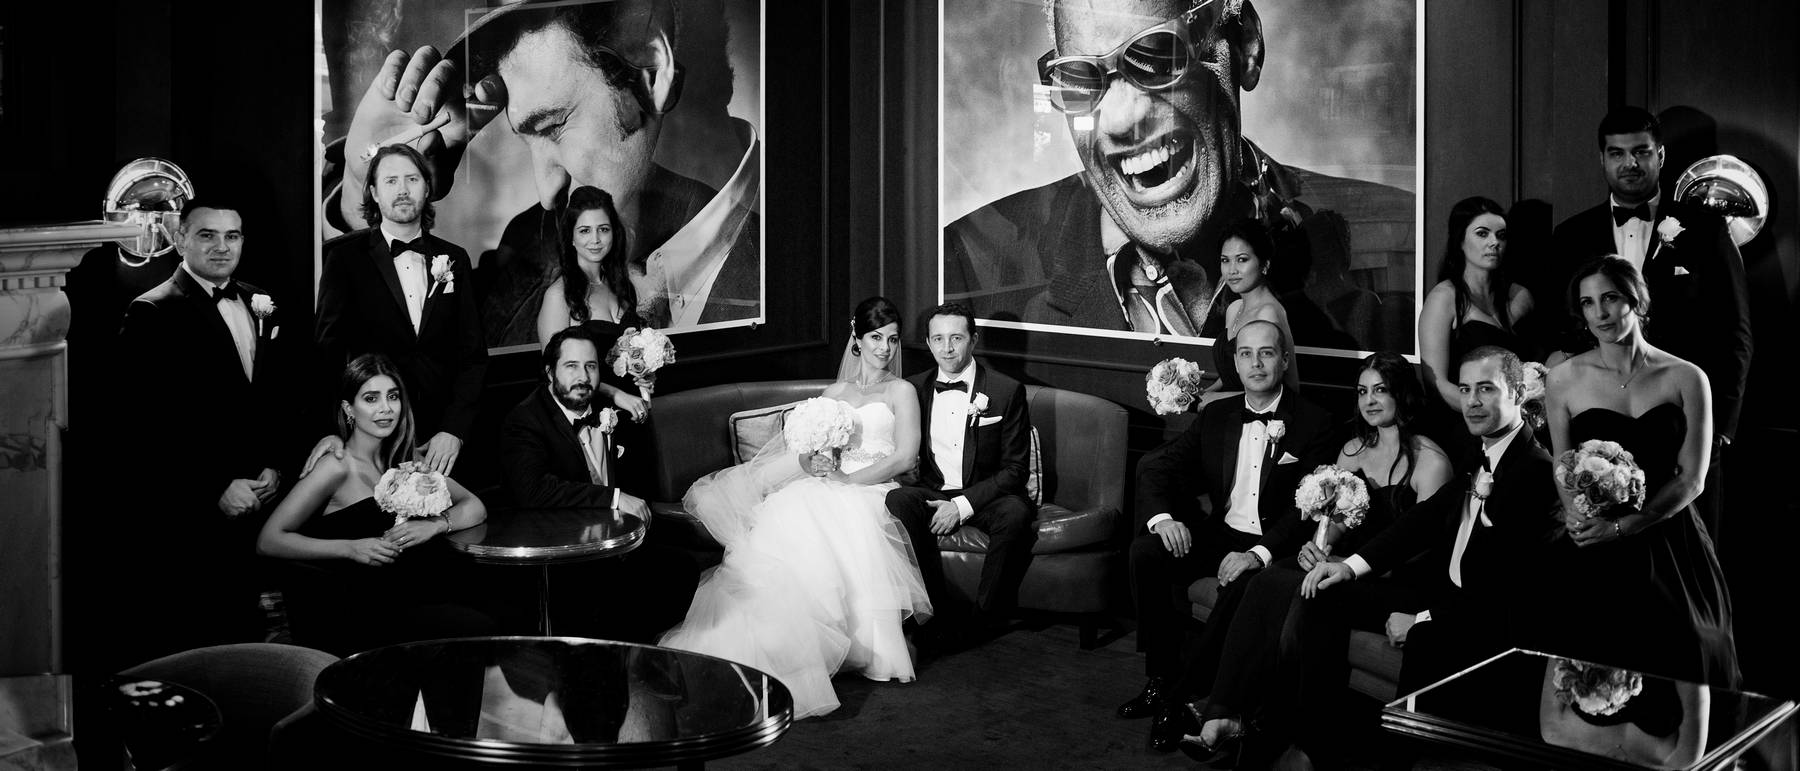 johnandjoseph-wedding-photographer-hz-slider-336